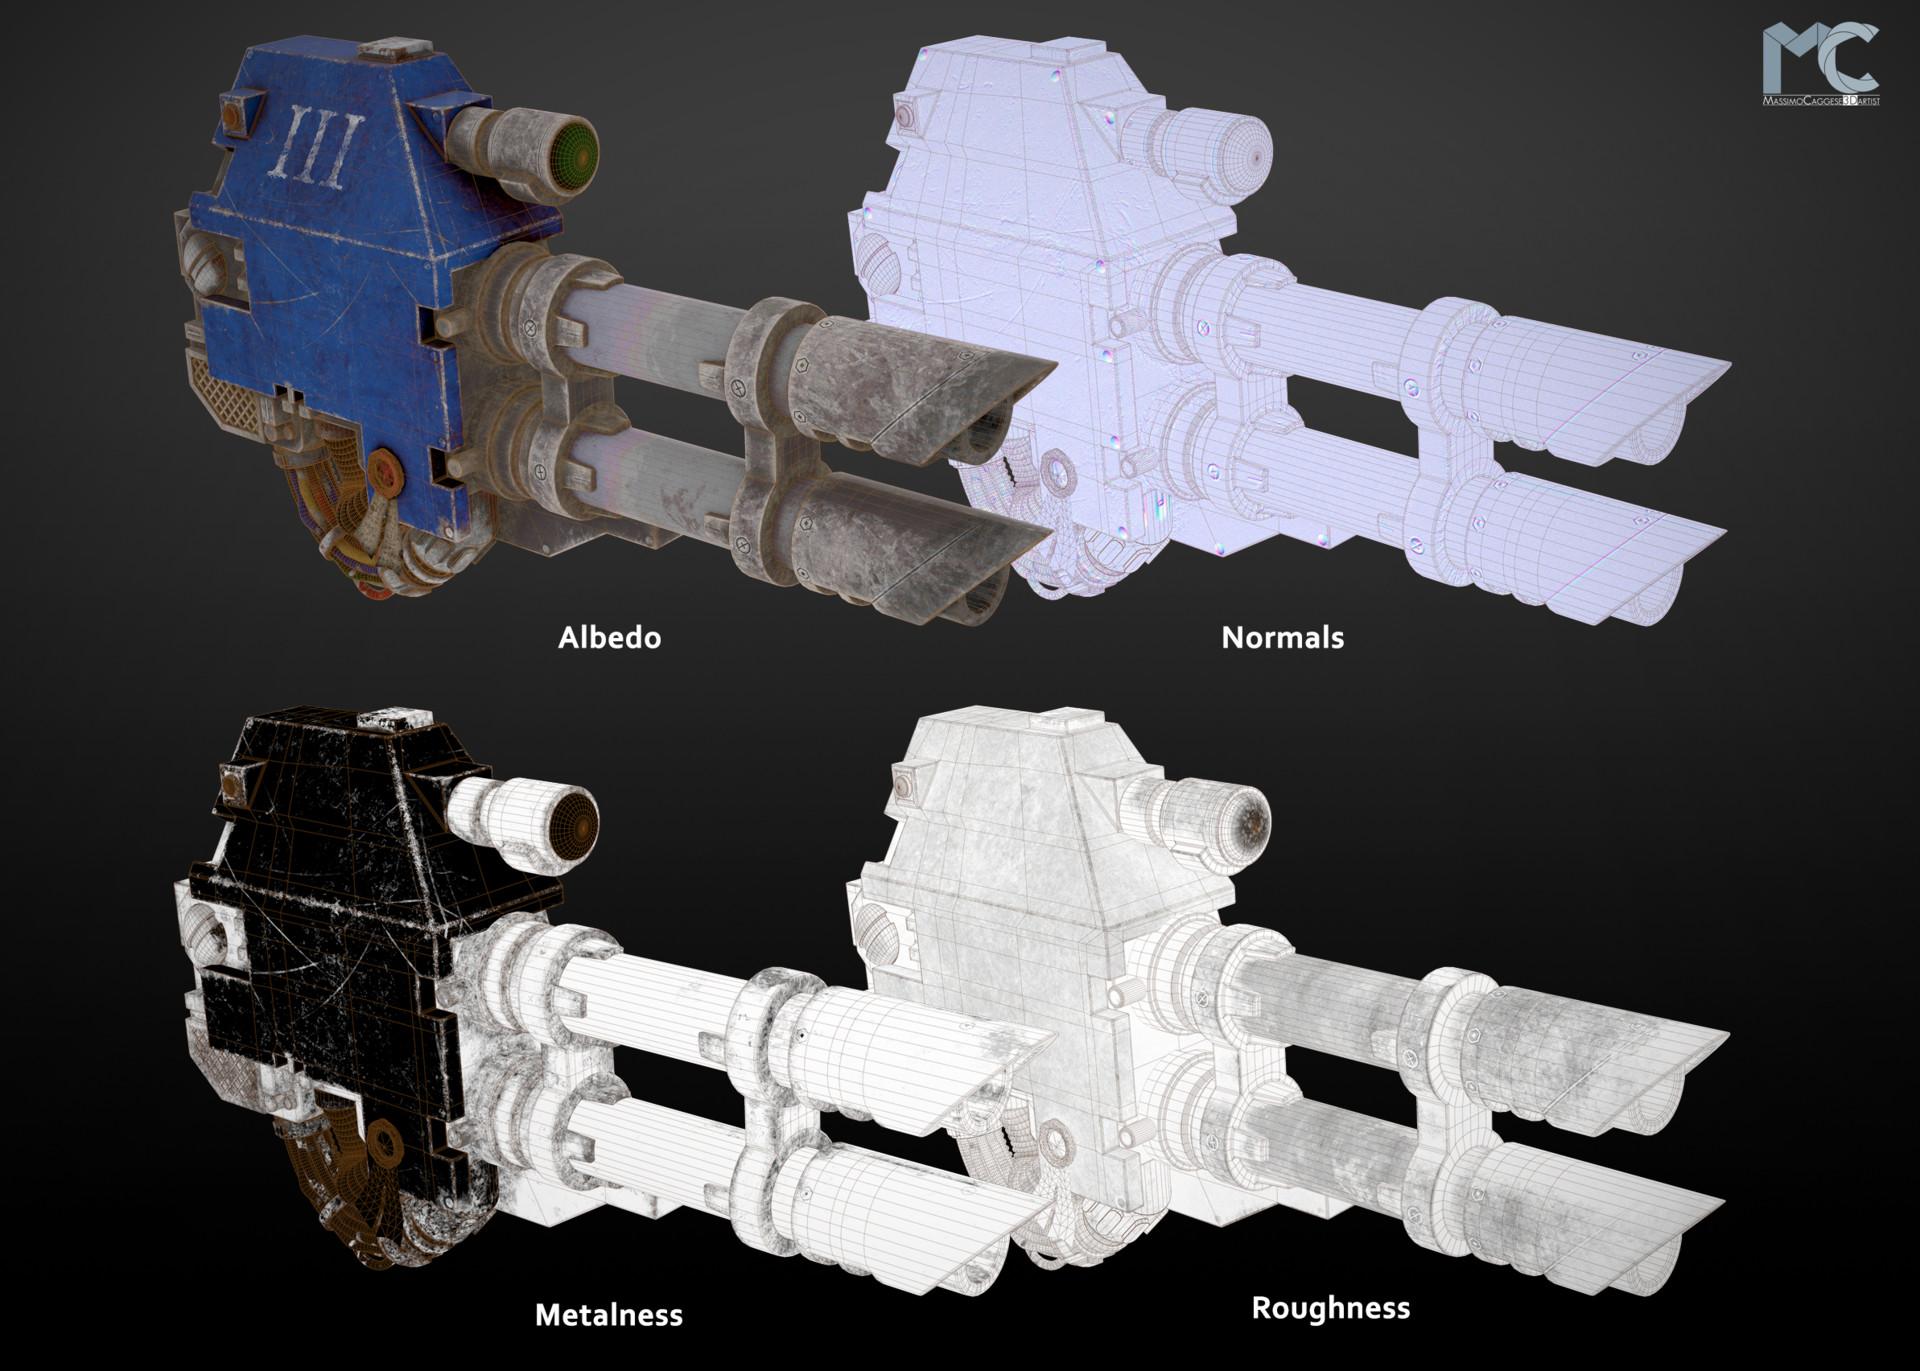 Maps displayed: Albedo, Normals, Metalness, Roughness.